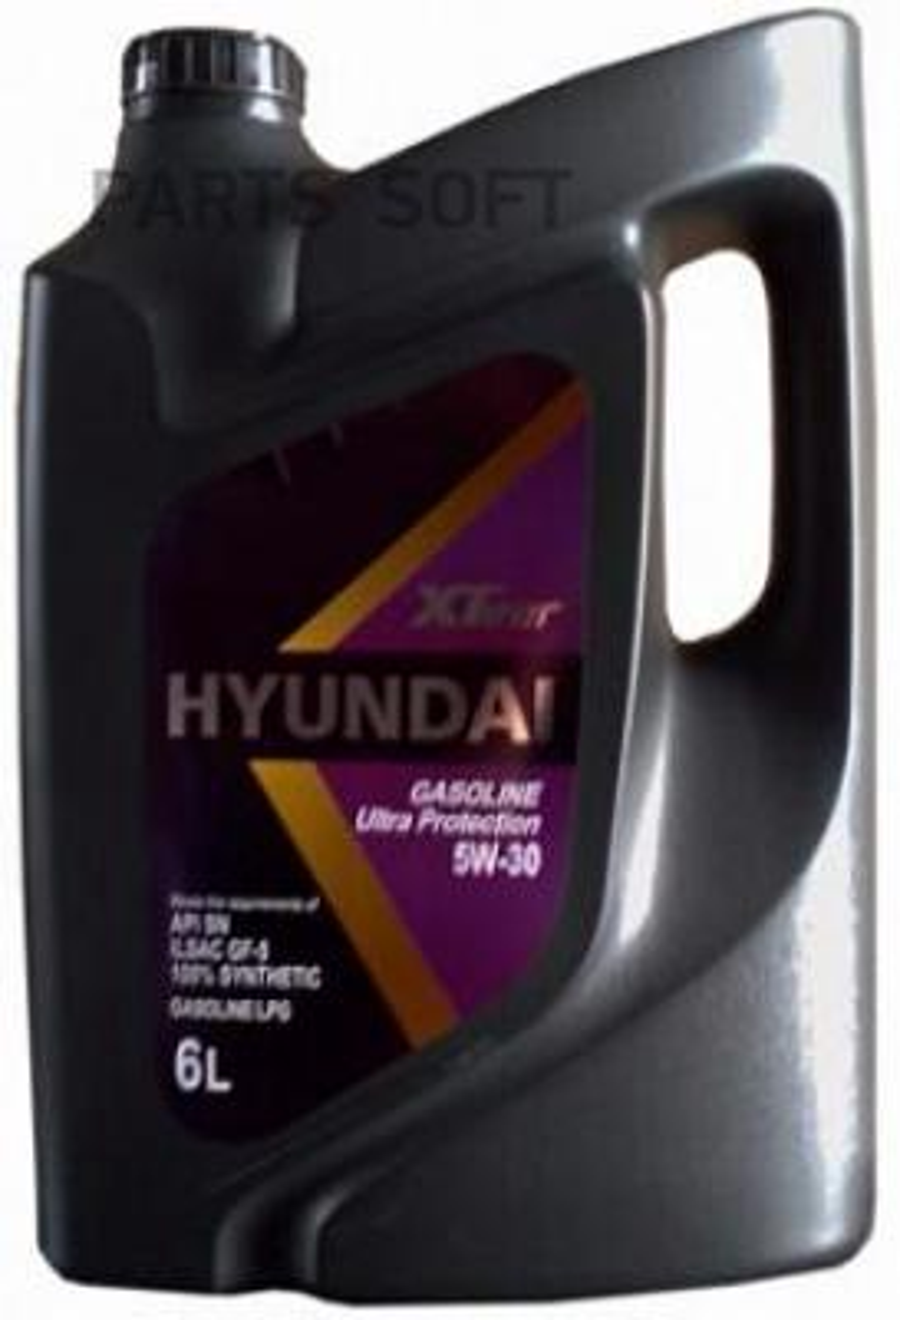 HYUNDAI XTeer Gasoline Ultra Protection 5W-30